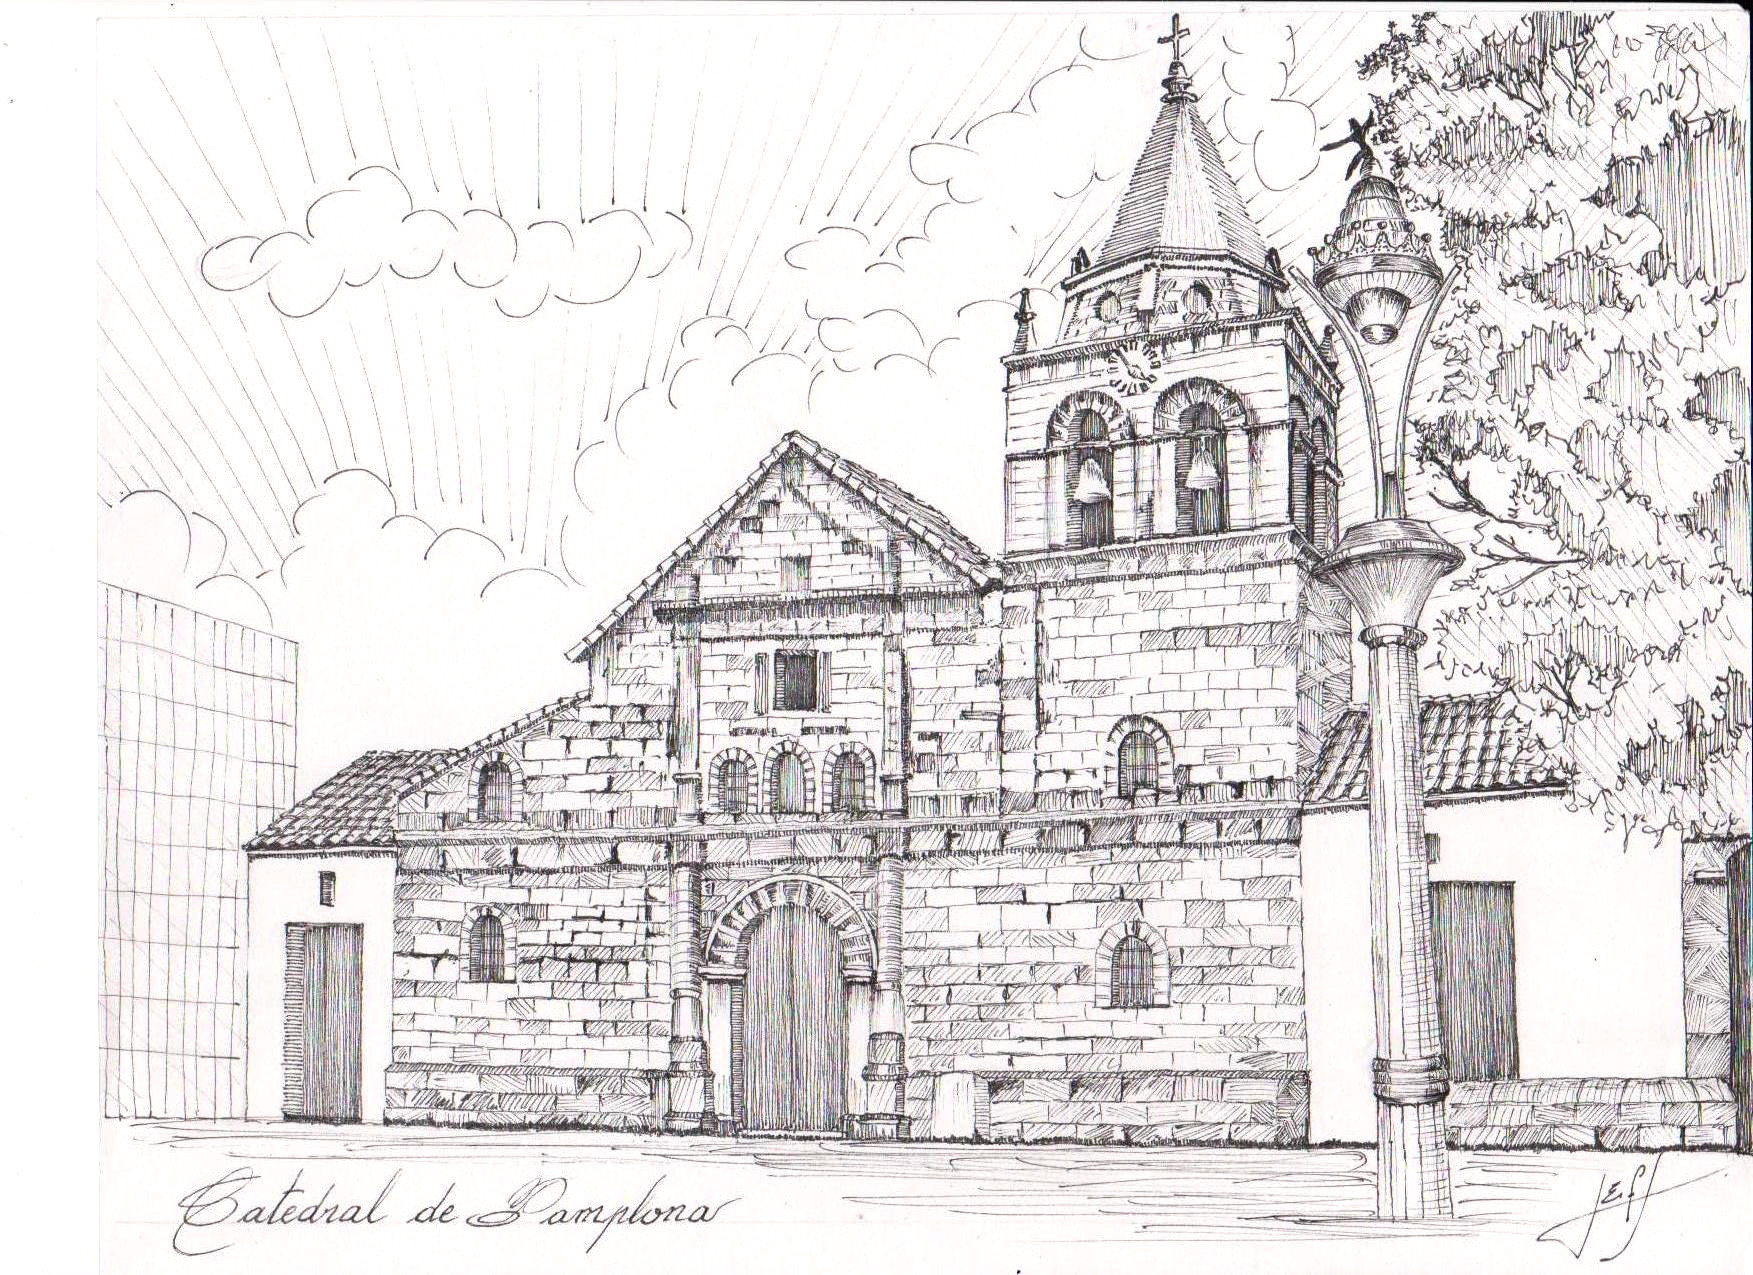 Catedral de Pamplona. Image © Jorge Eduardo Fernández Saavedra